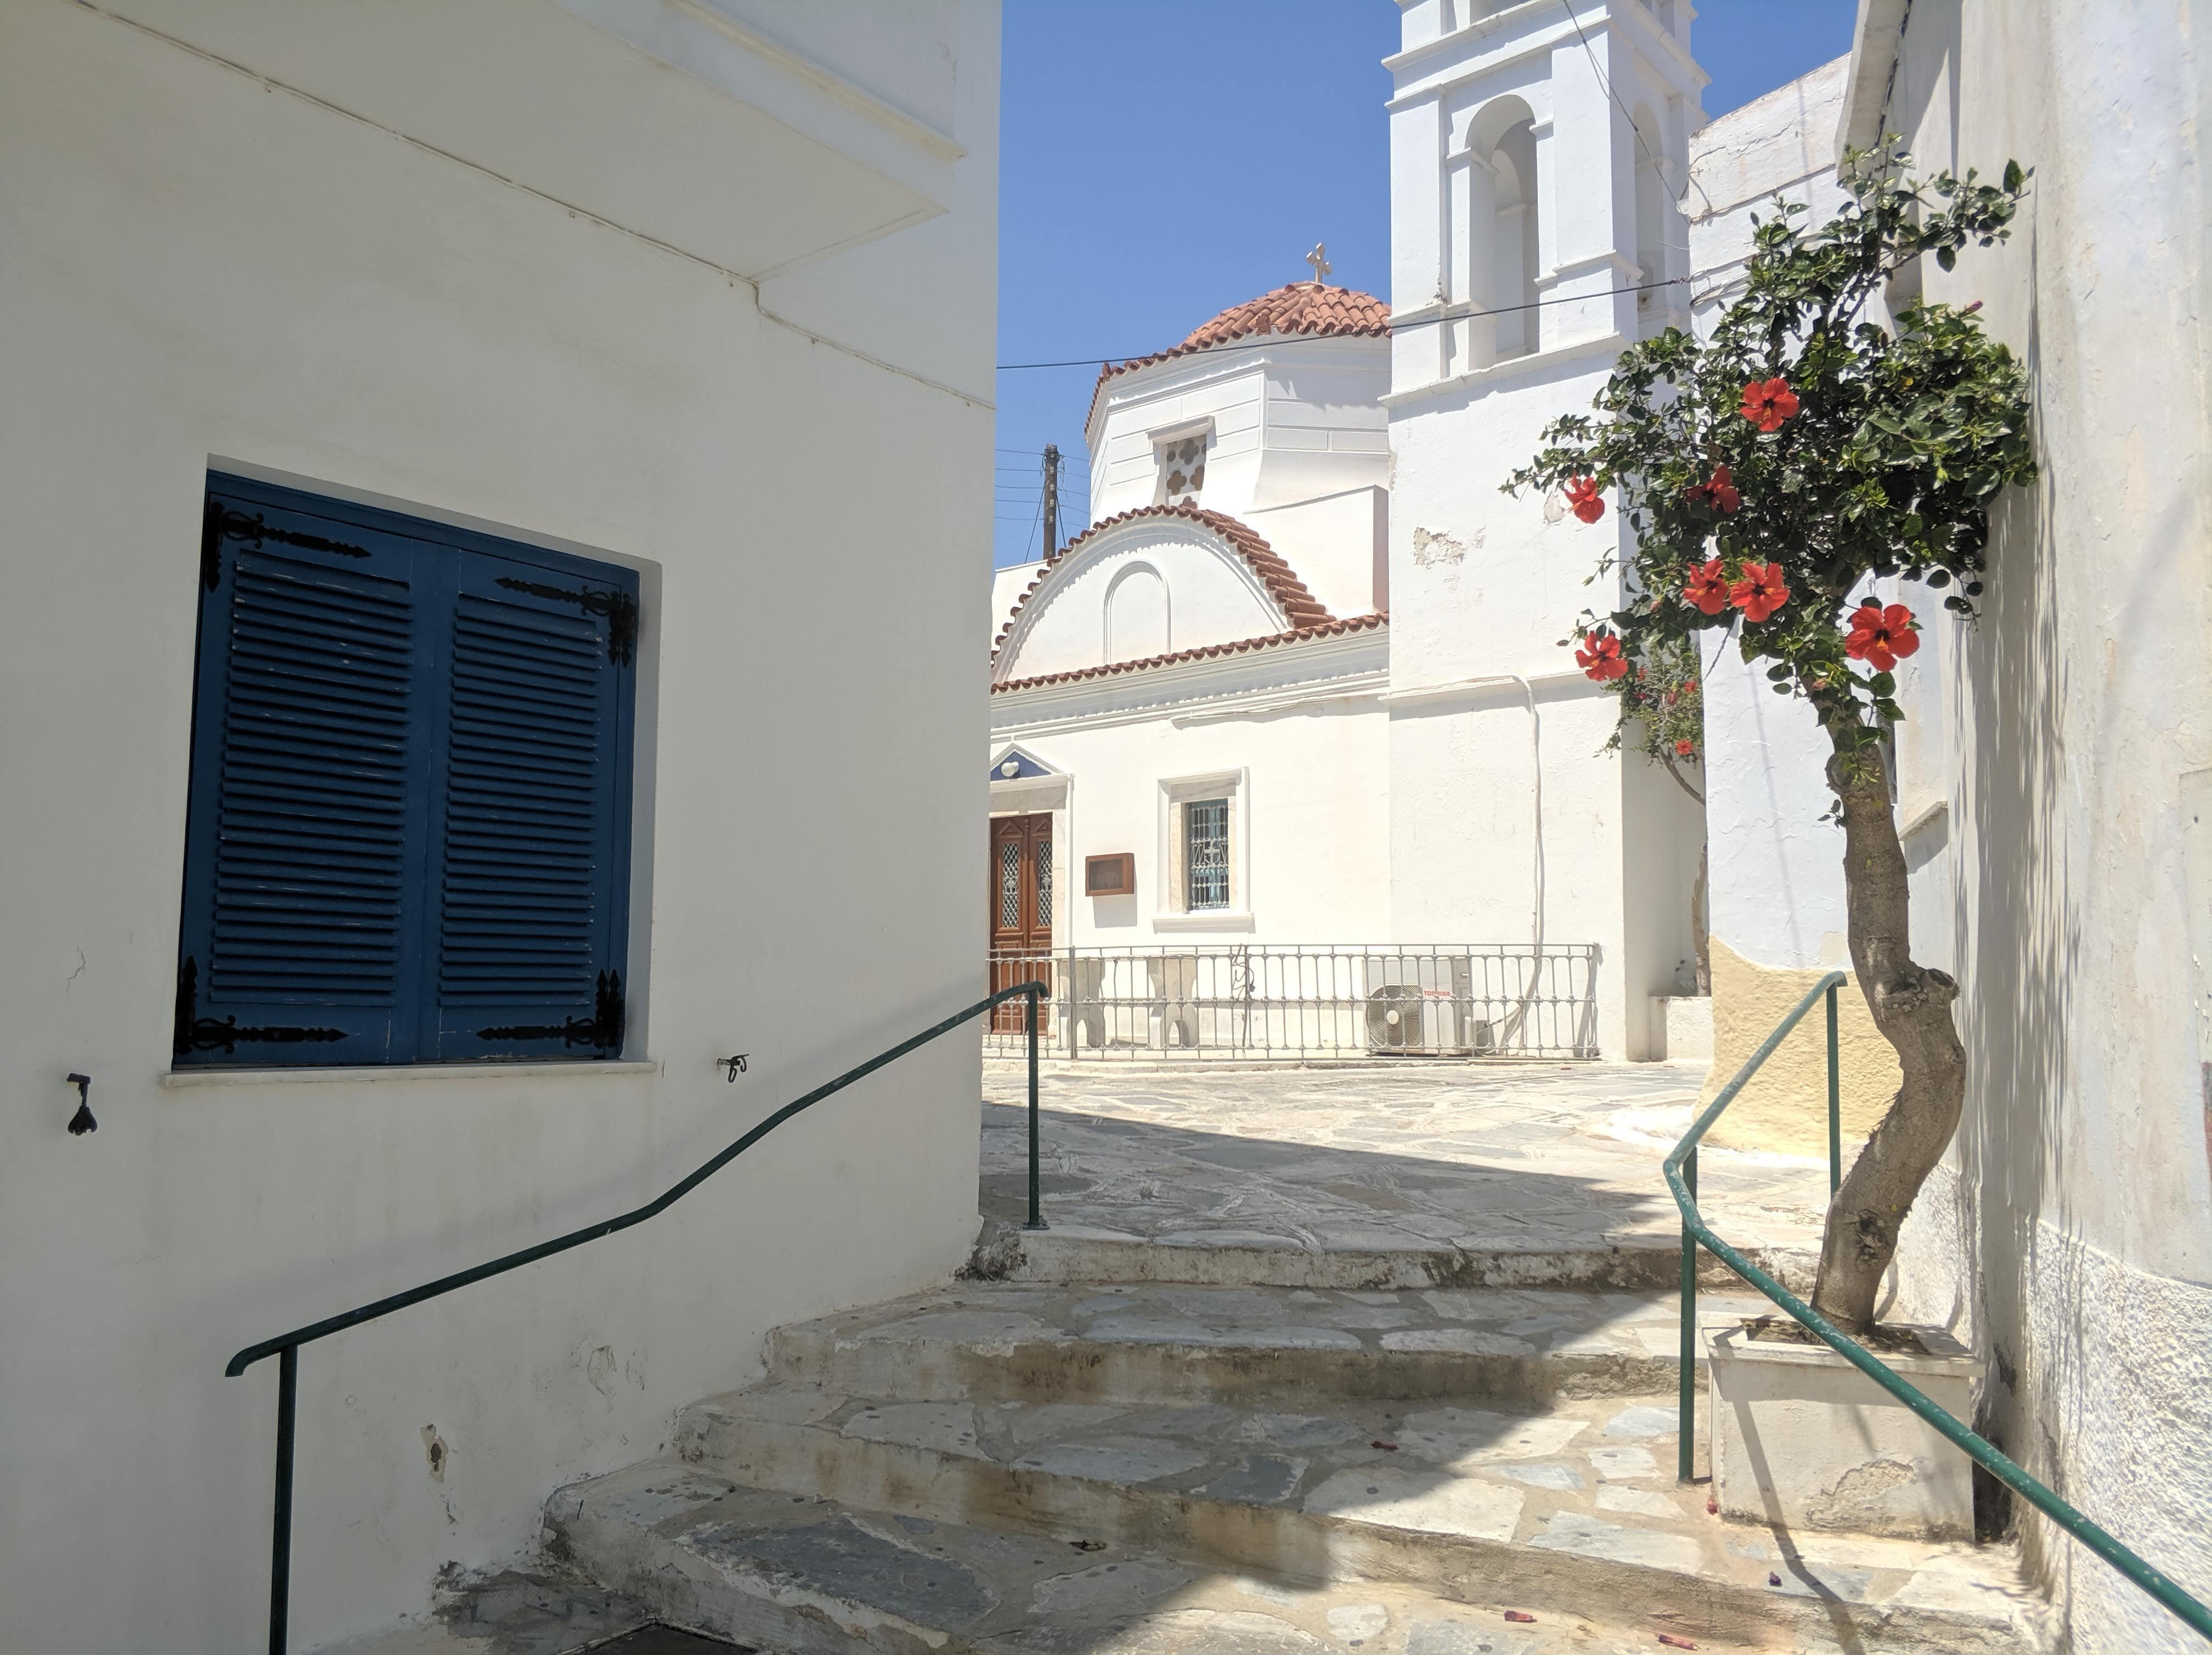 vacante personalizate grecia, Vacanțe personalizate Grecia